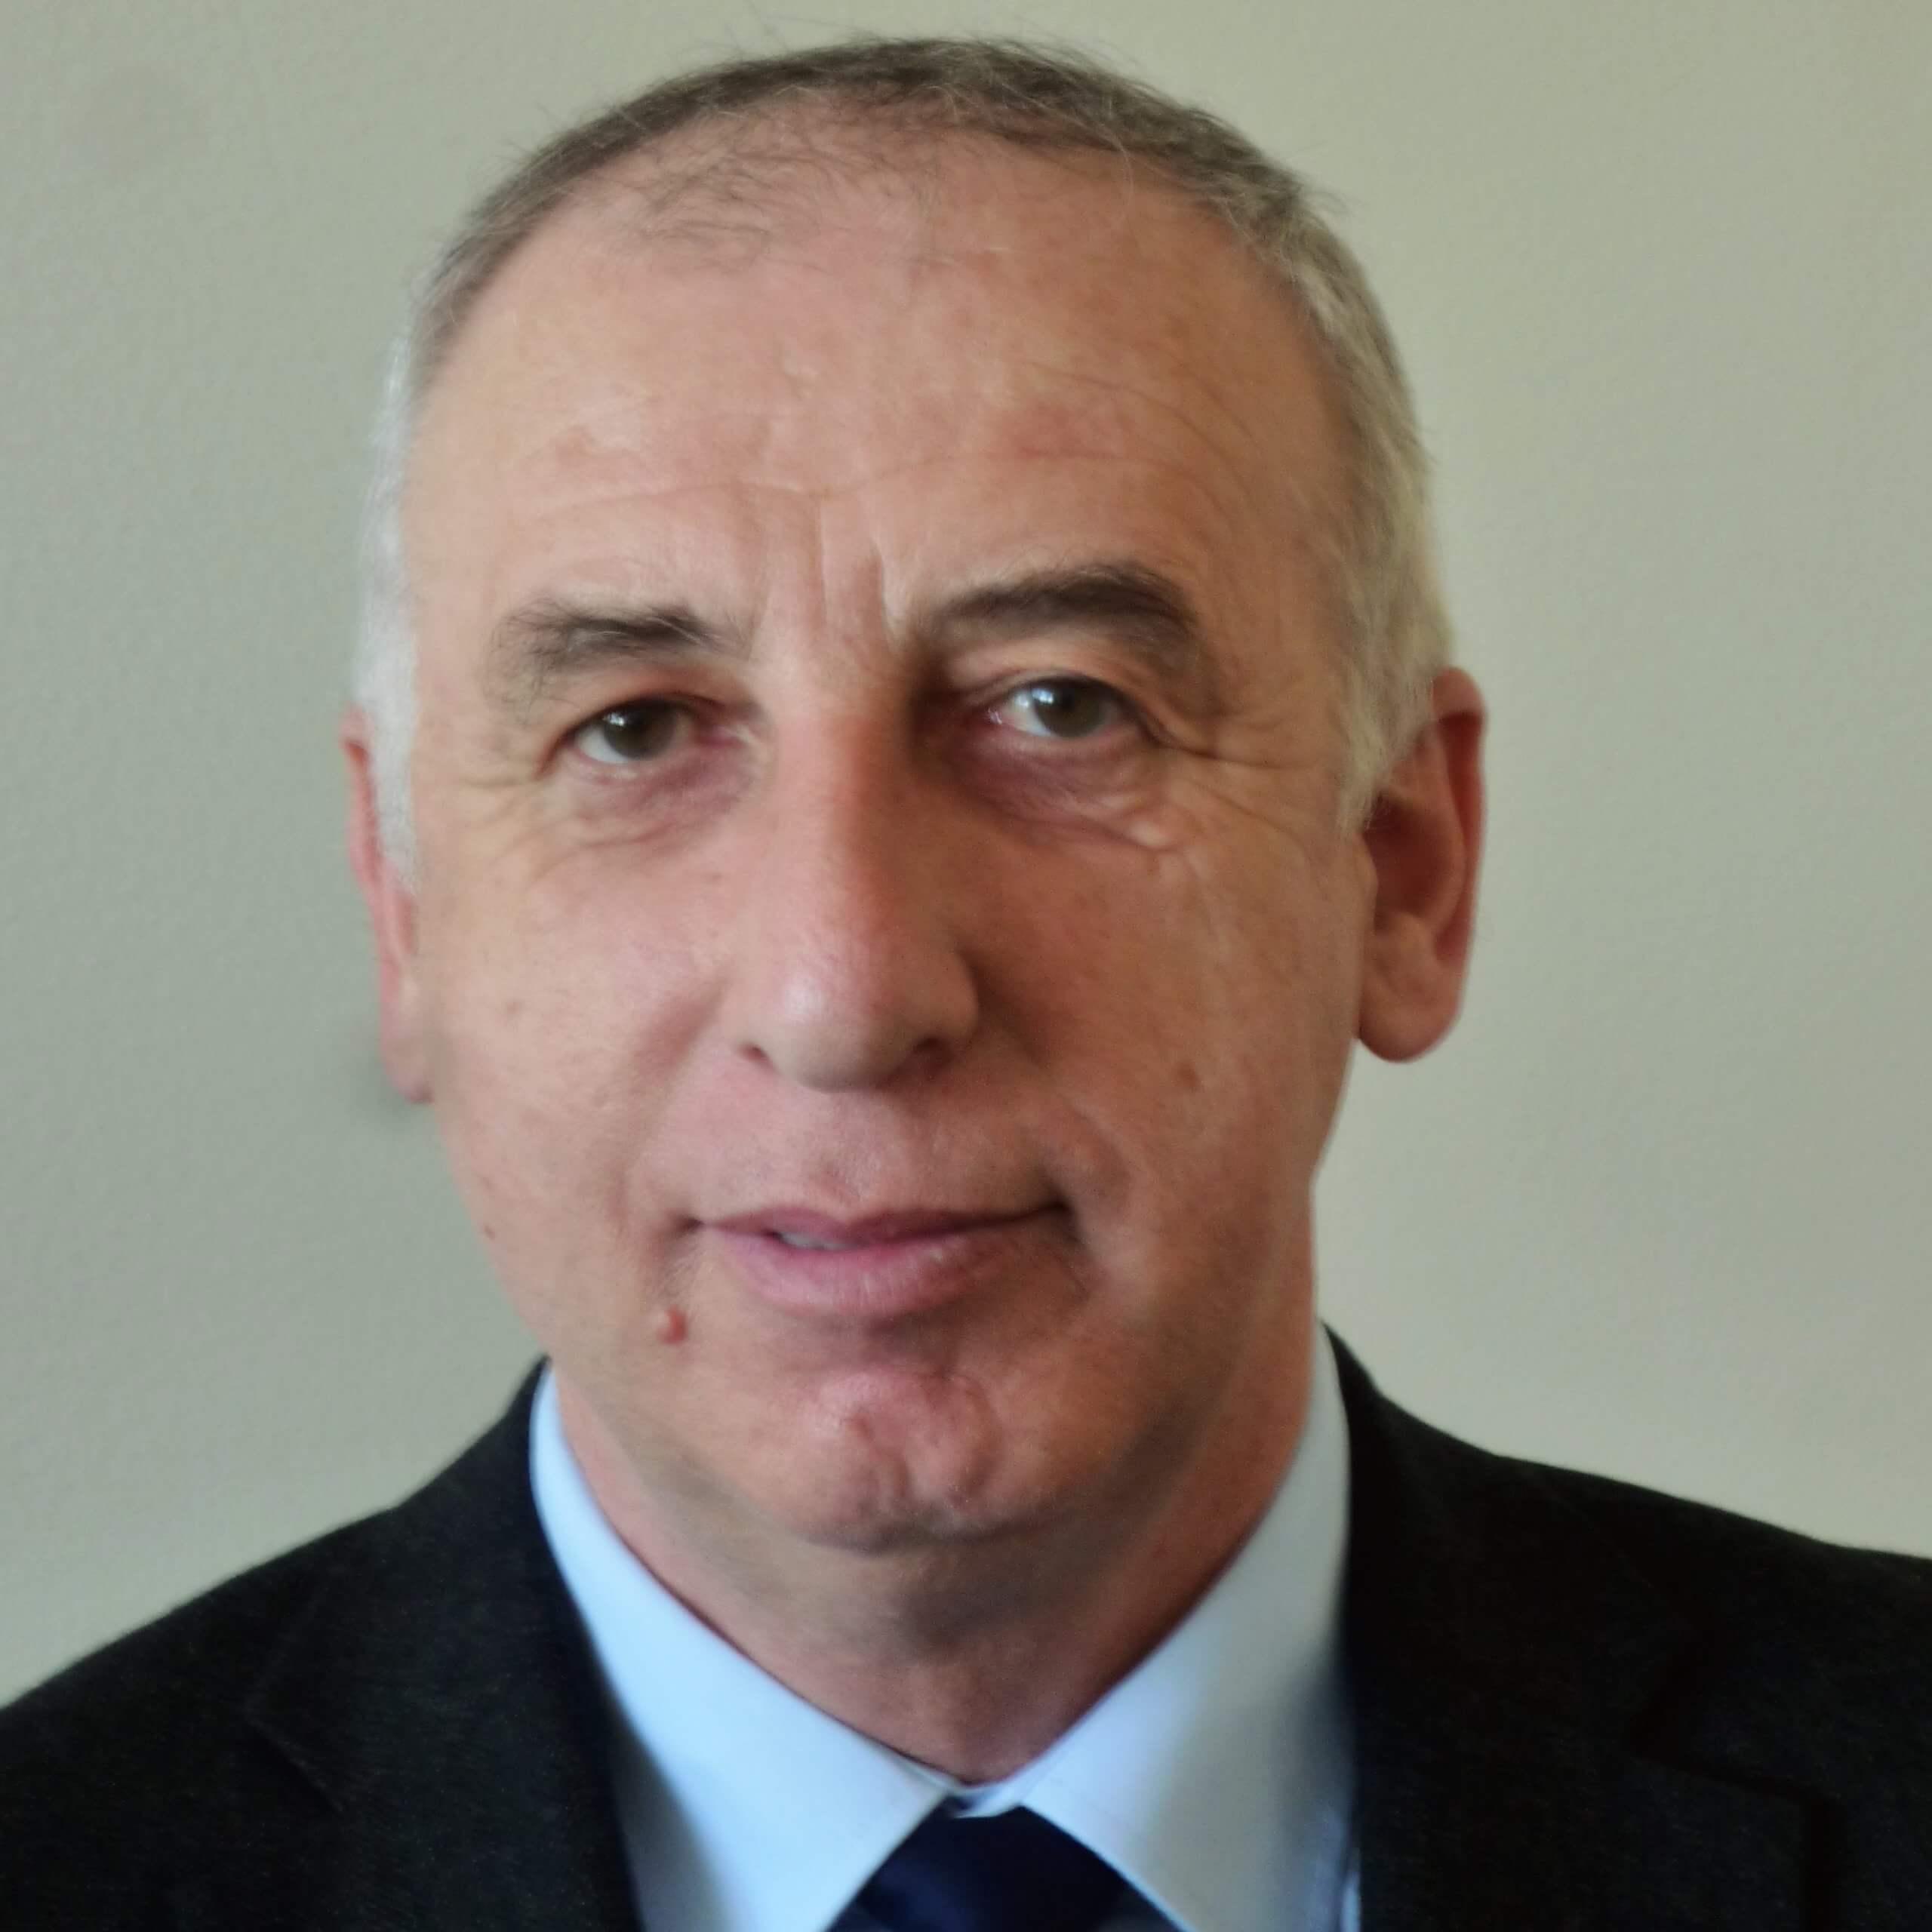 Profilová fotka doc. Ing. Miroslav Maršálek, CSc.